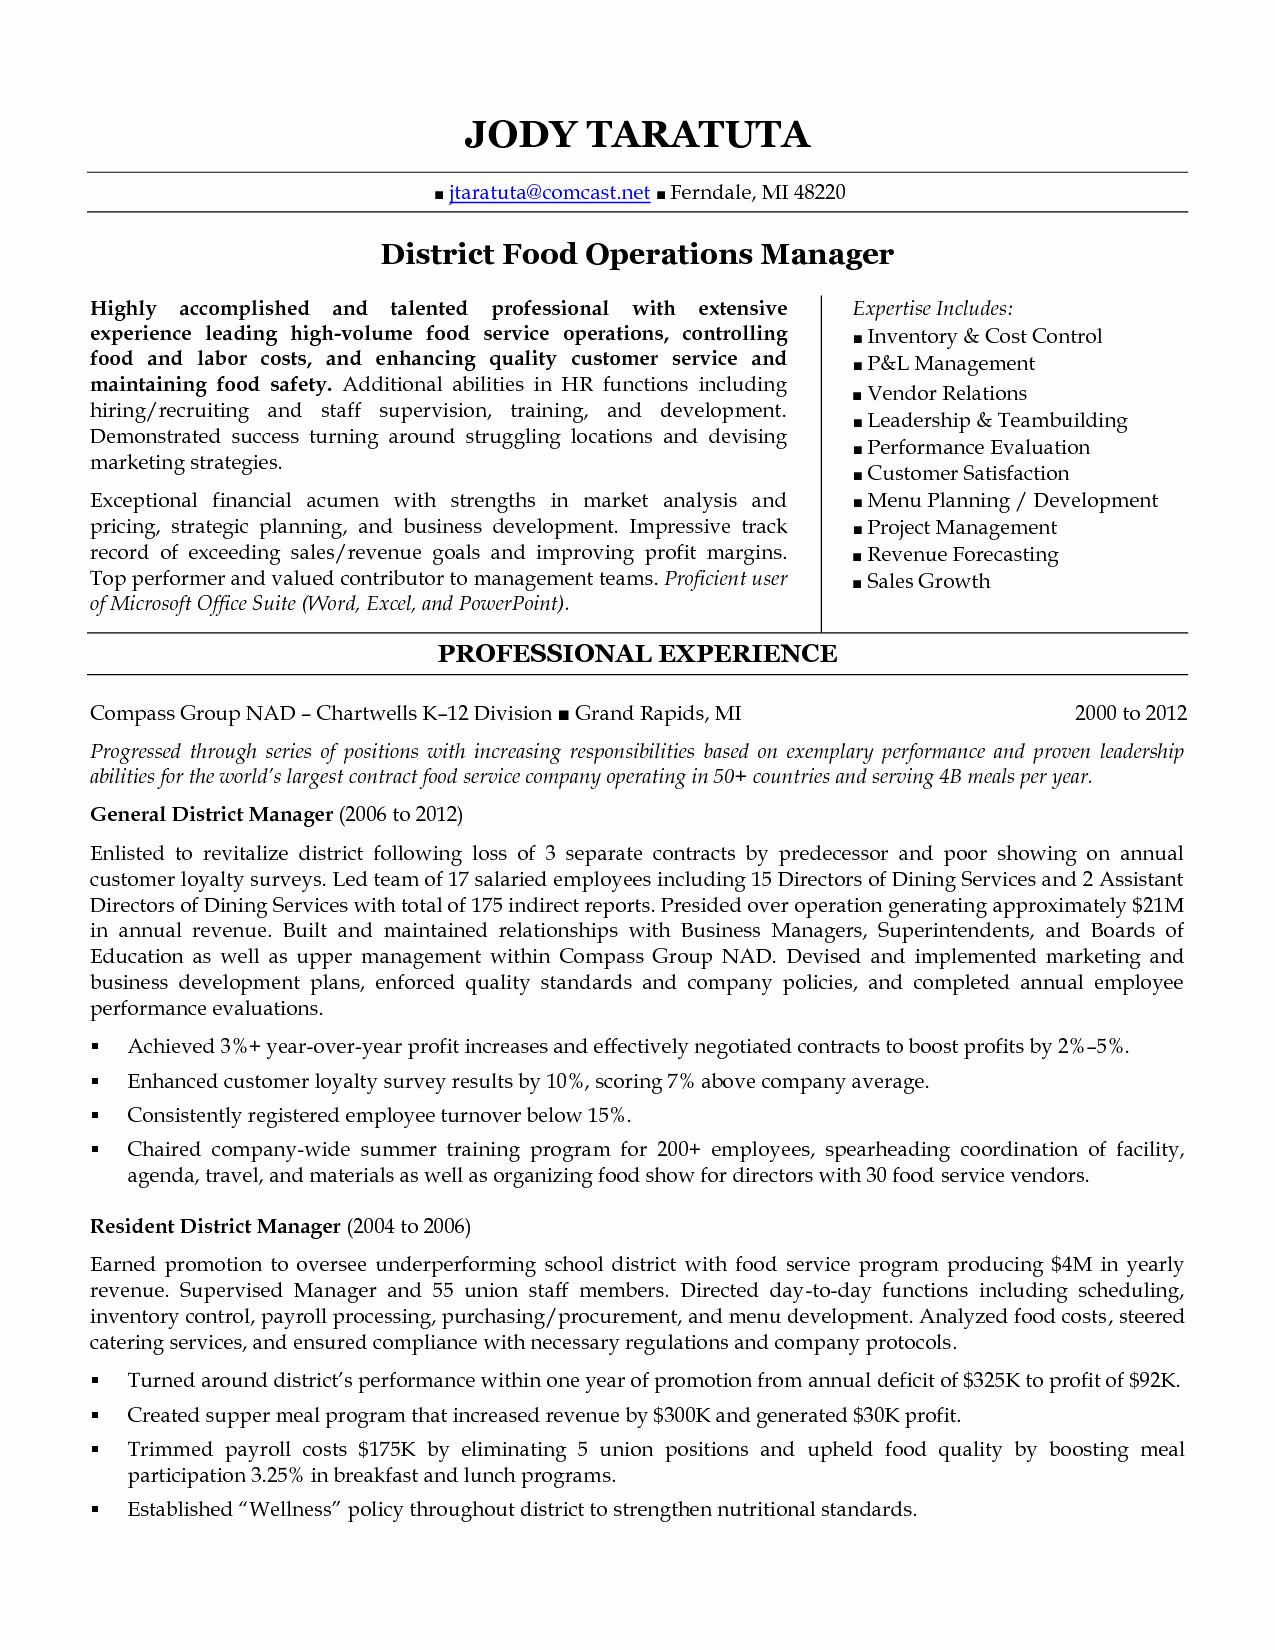 Operations Manager Resume Sample Pdf Elegant District Manager Resume